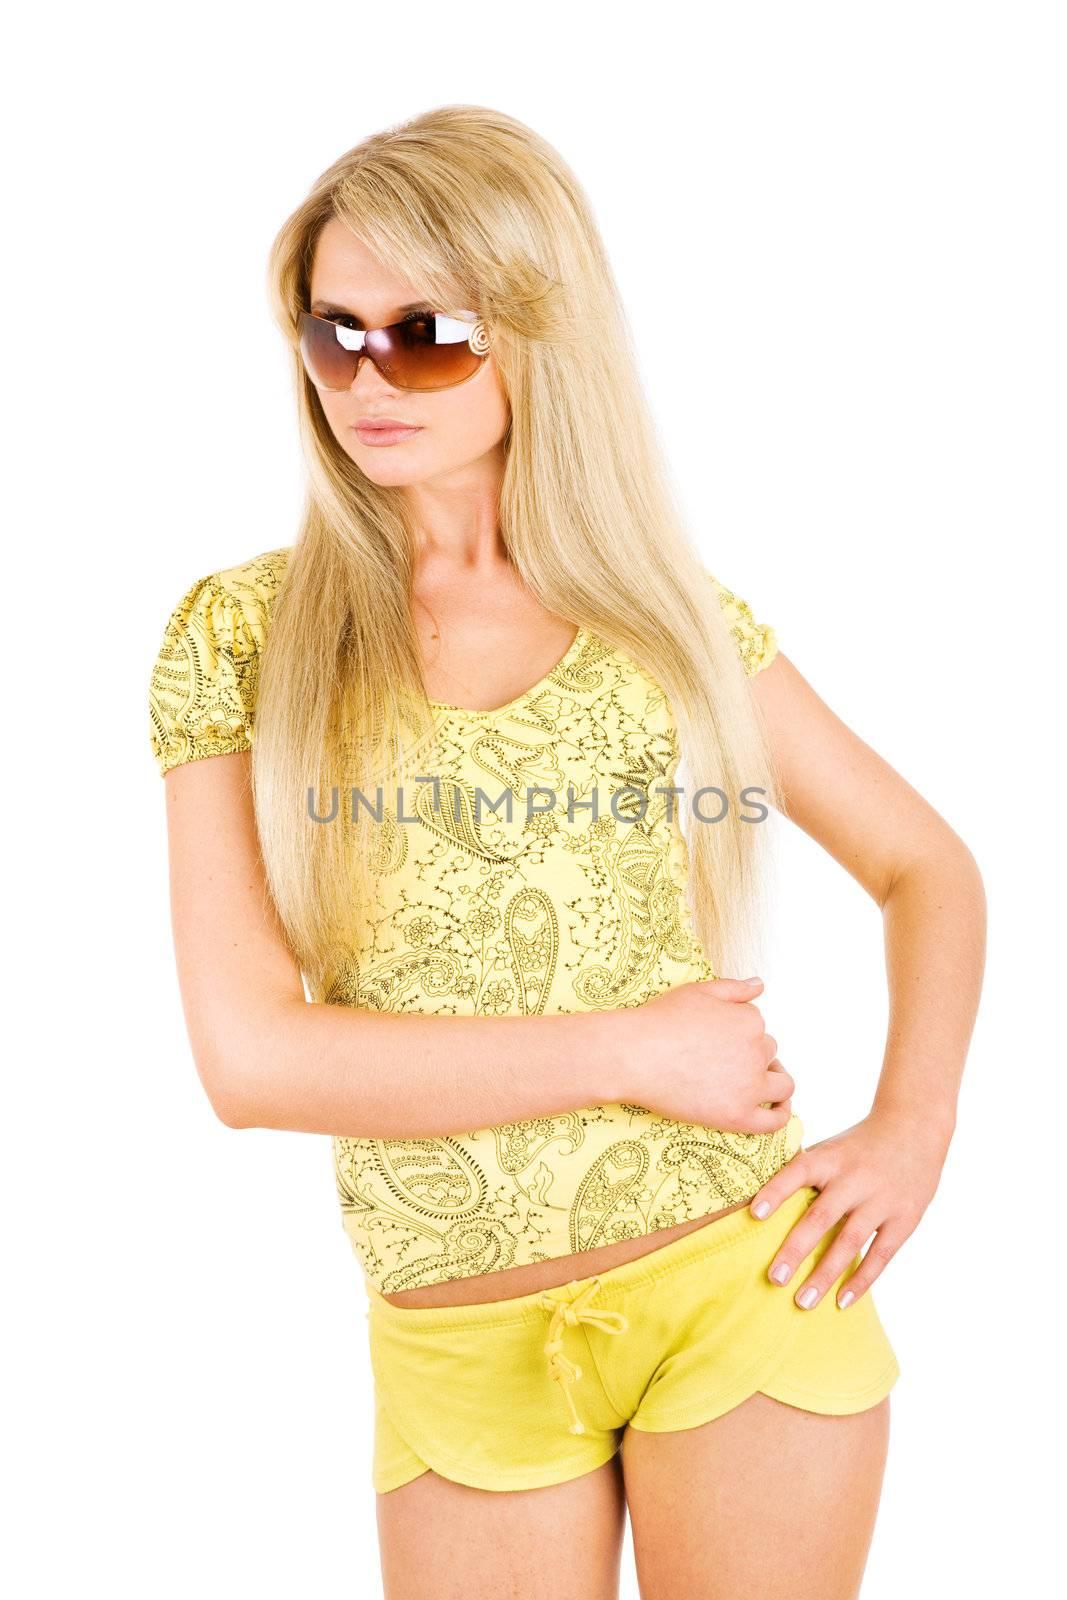 beauty blond in sunglasses